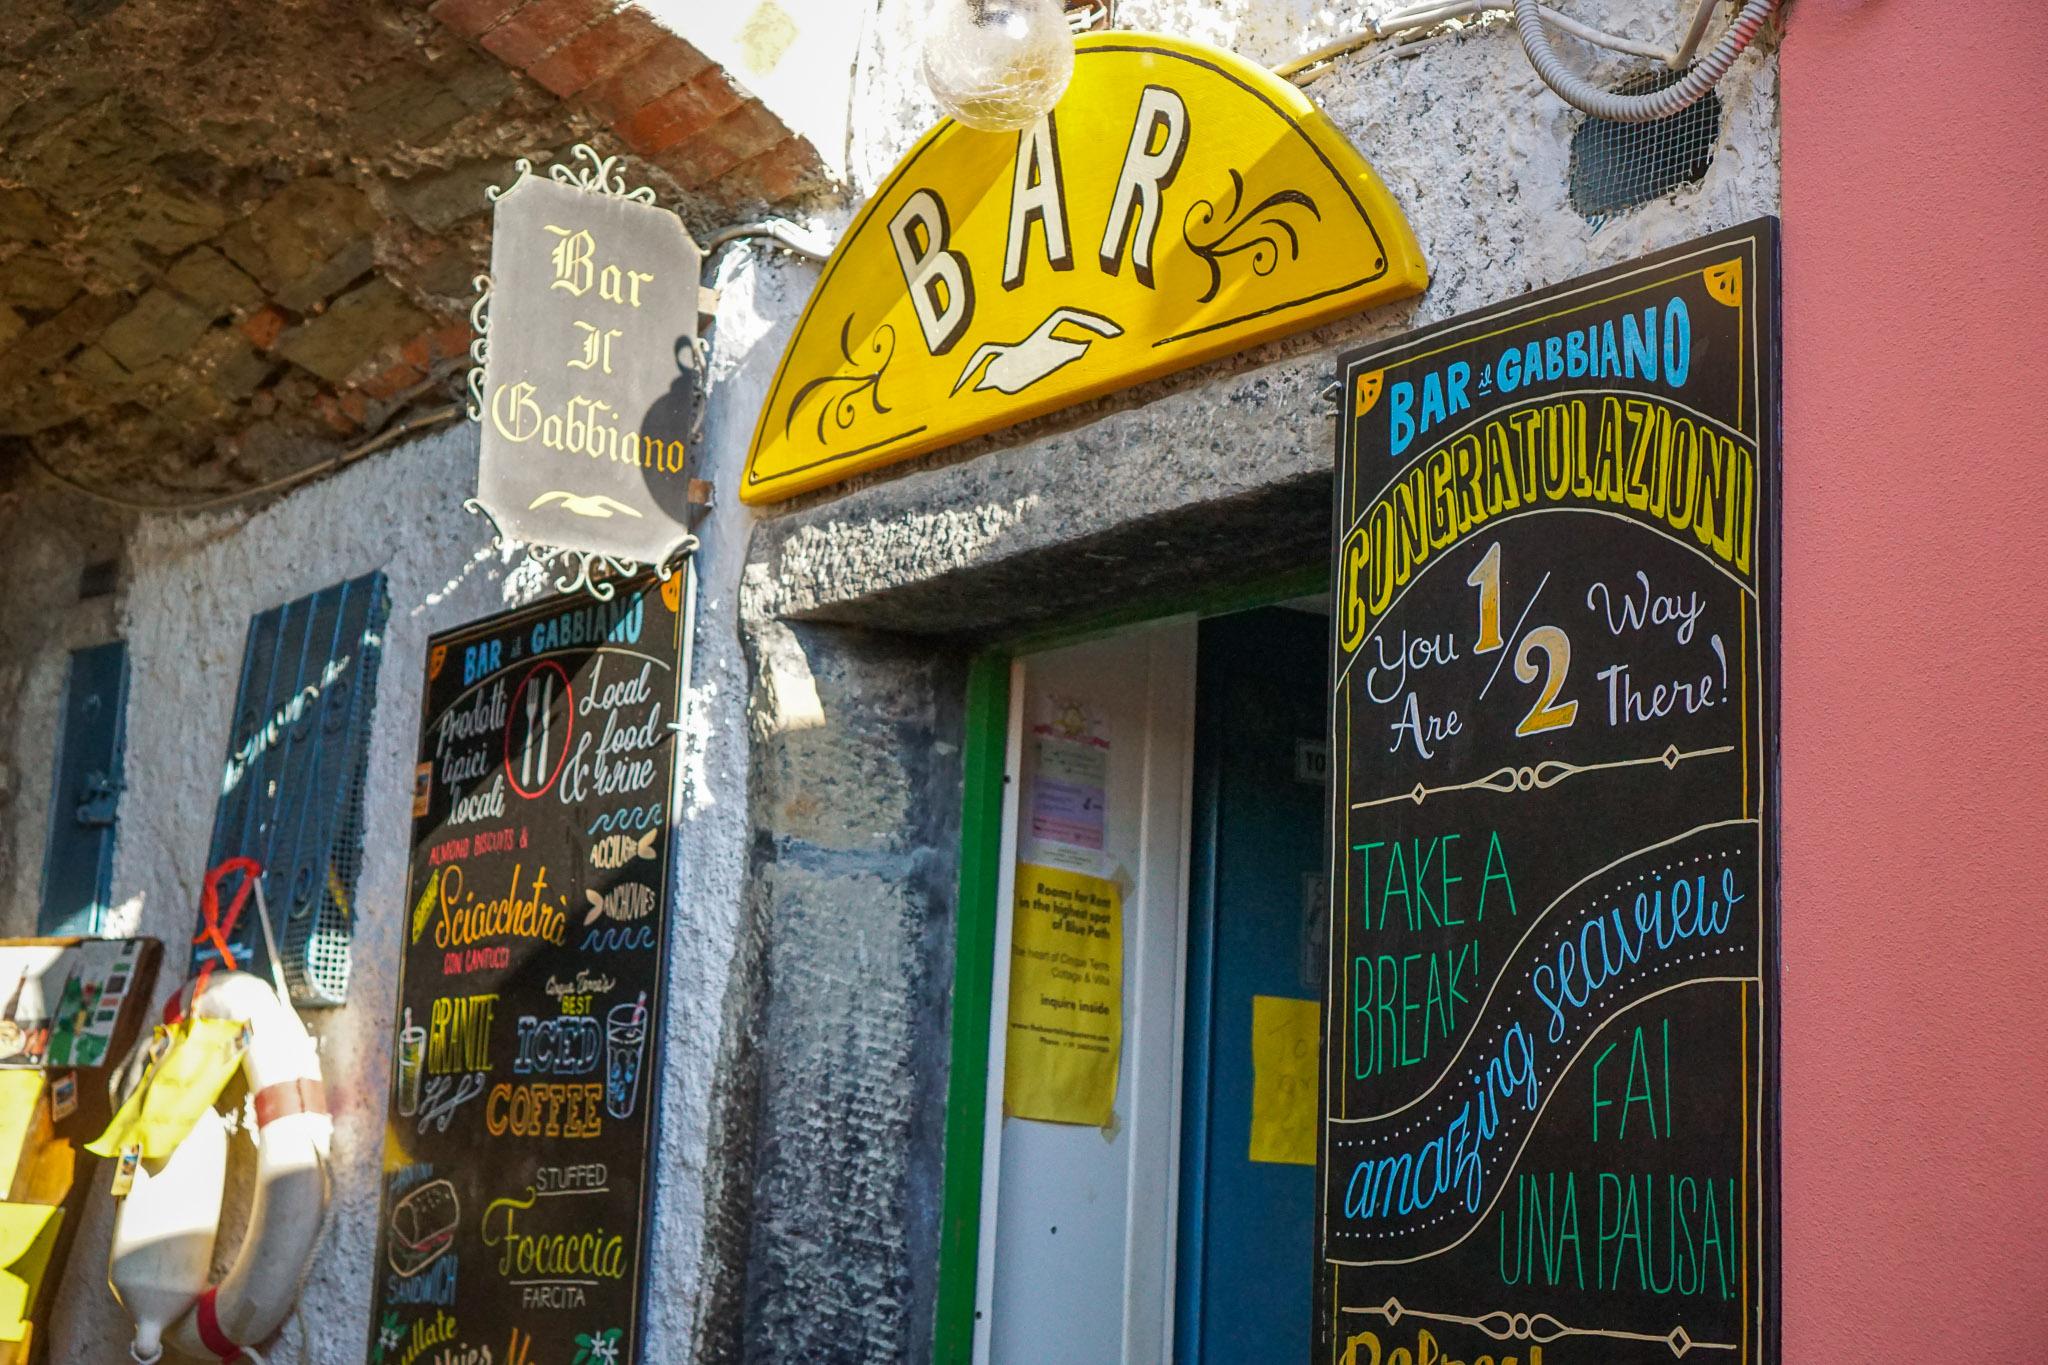 Make sure to take a break at Bar Il Gabbiano on your way from Corniglia to Vernazza.